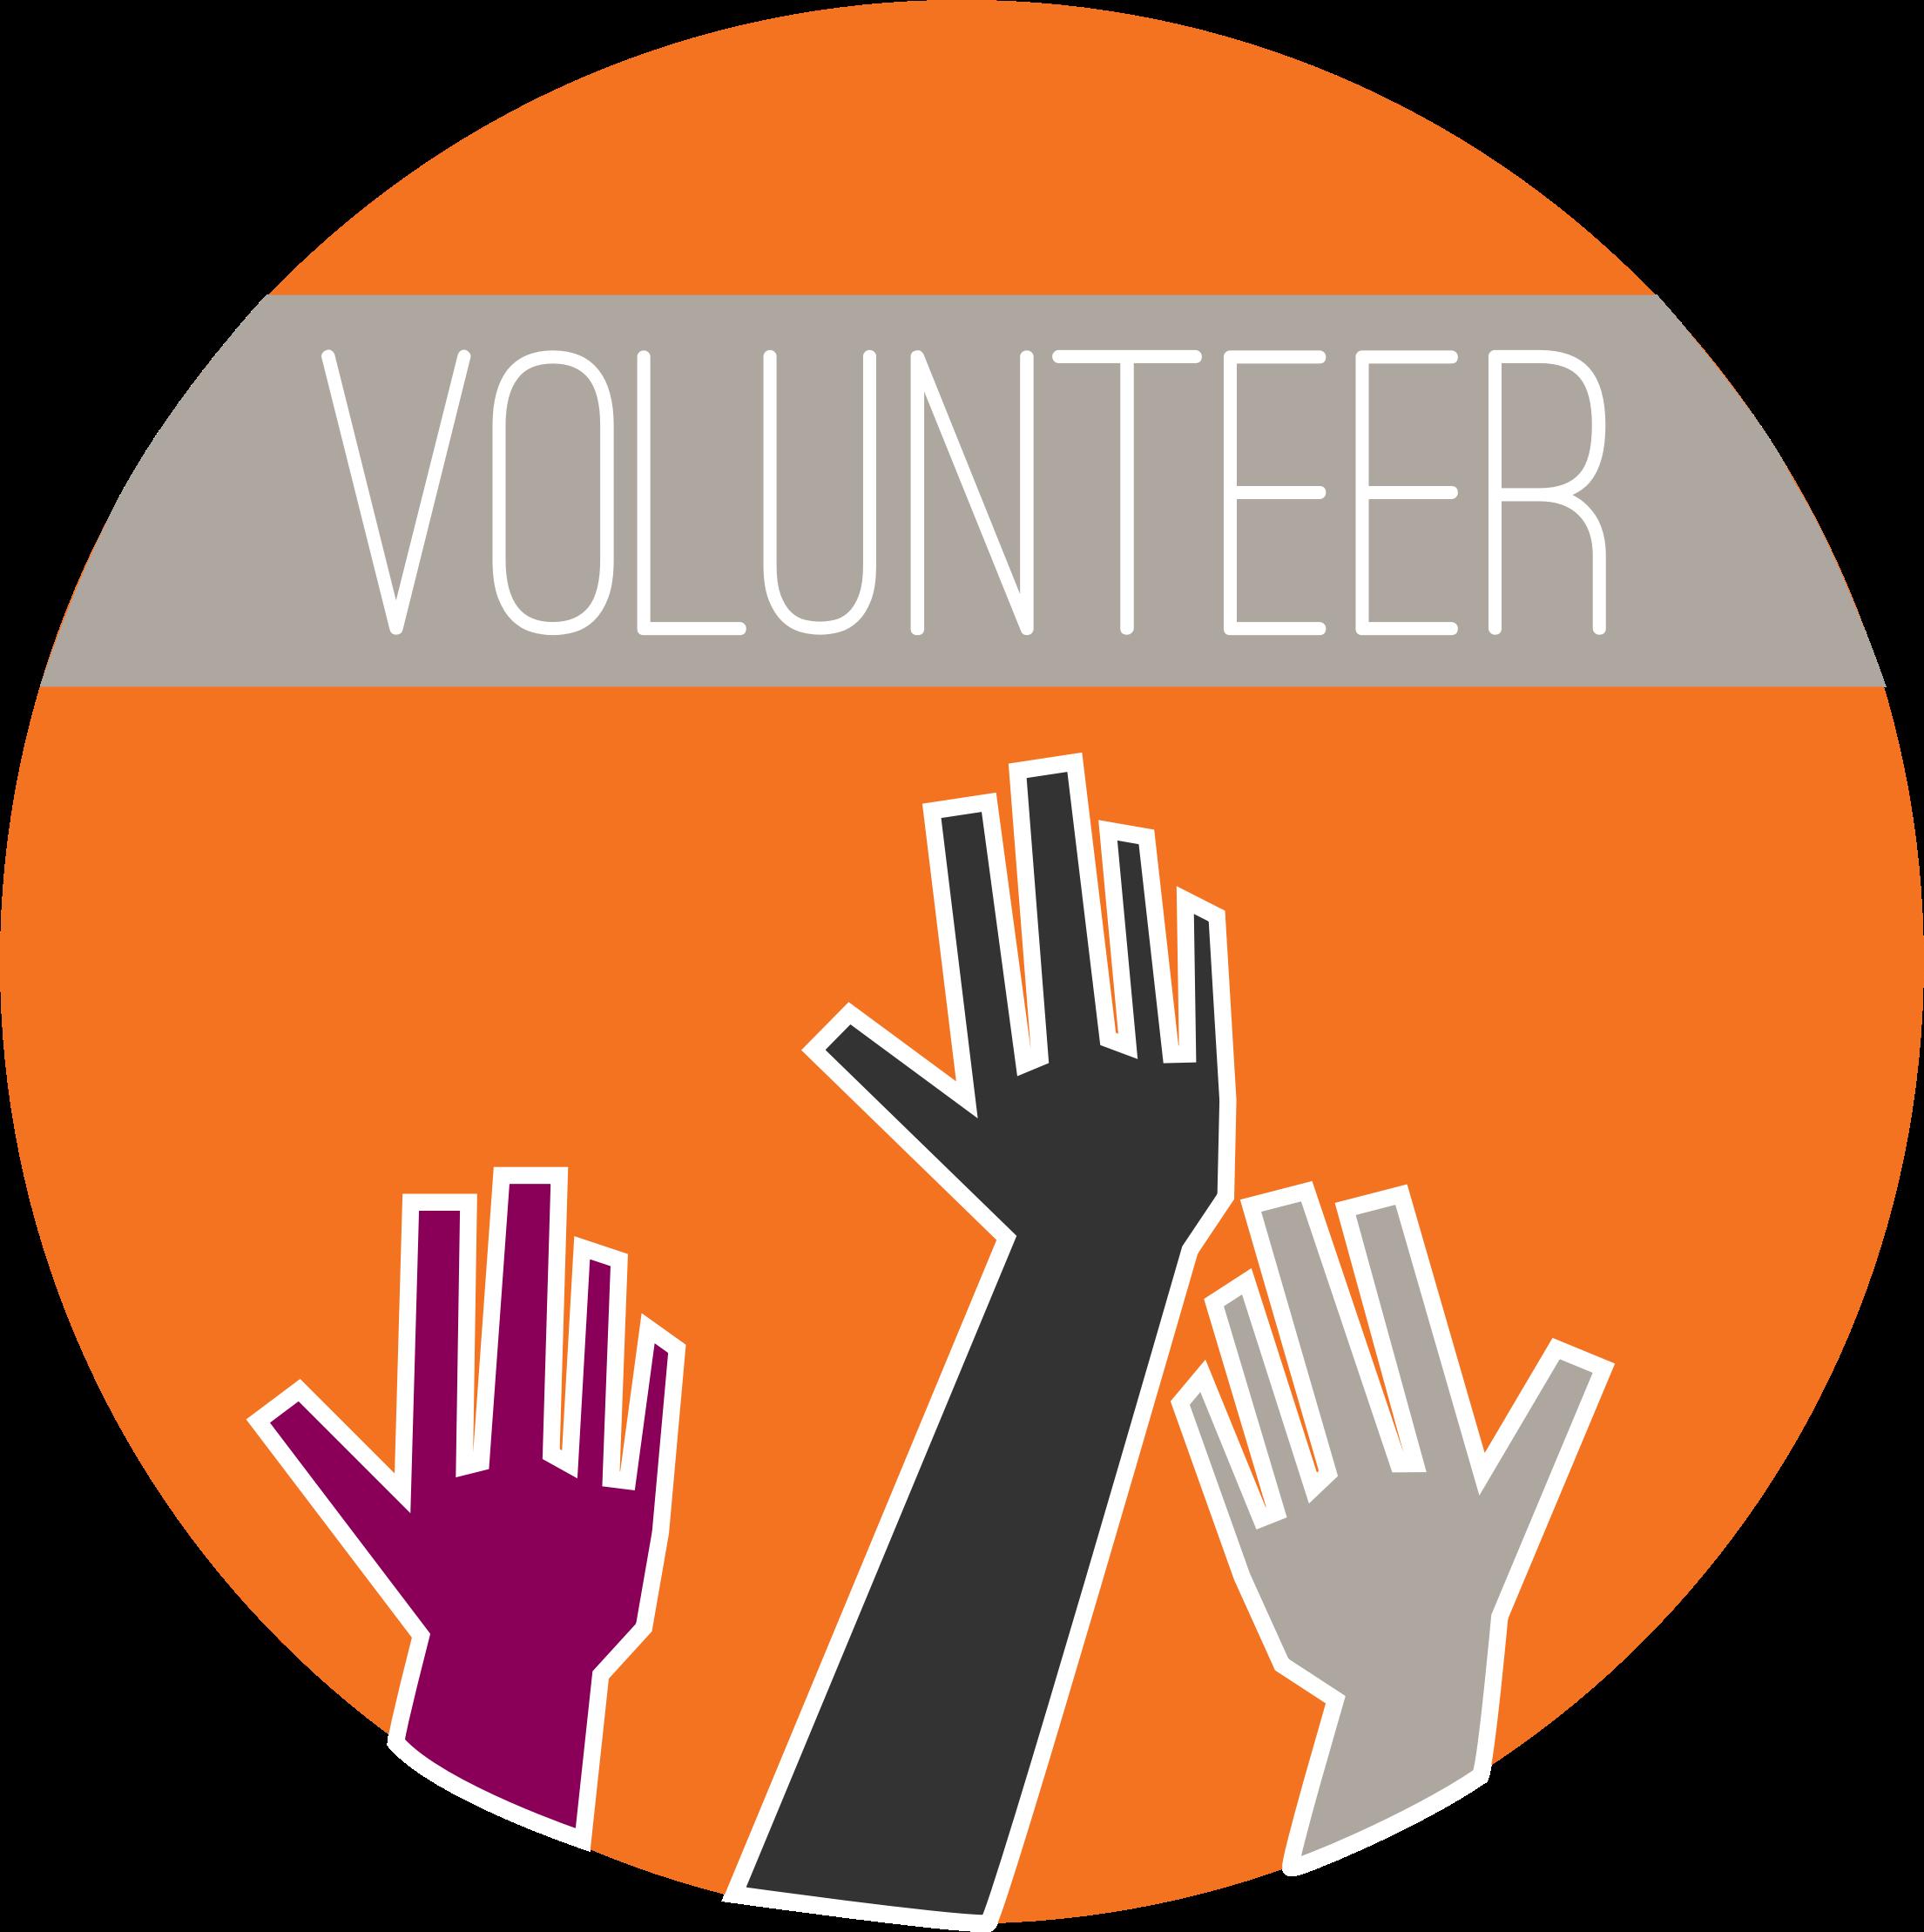 Volunteering clipart logo. Round big image png